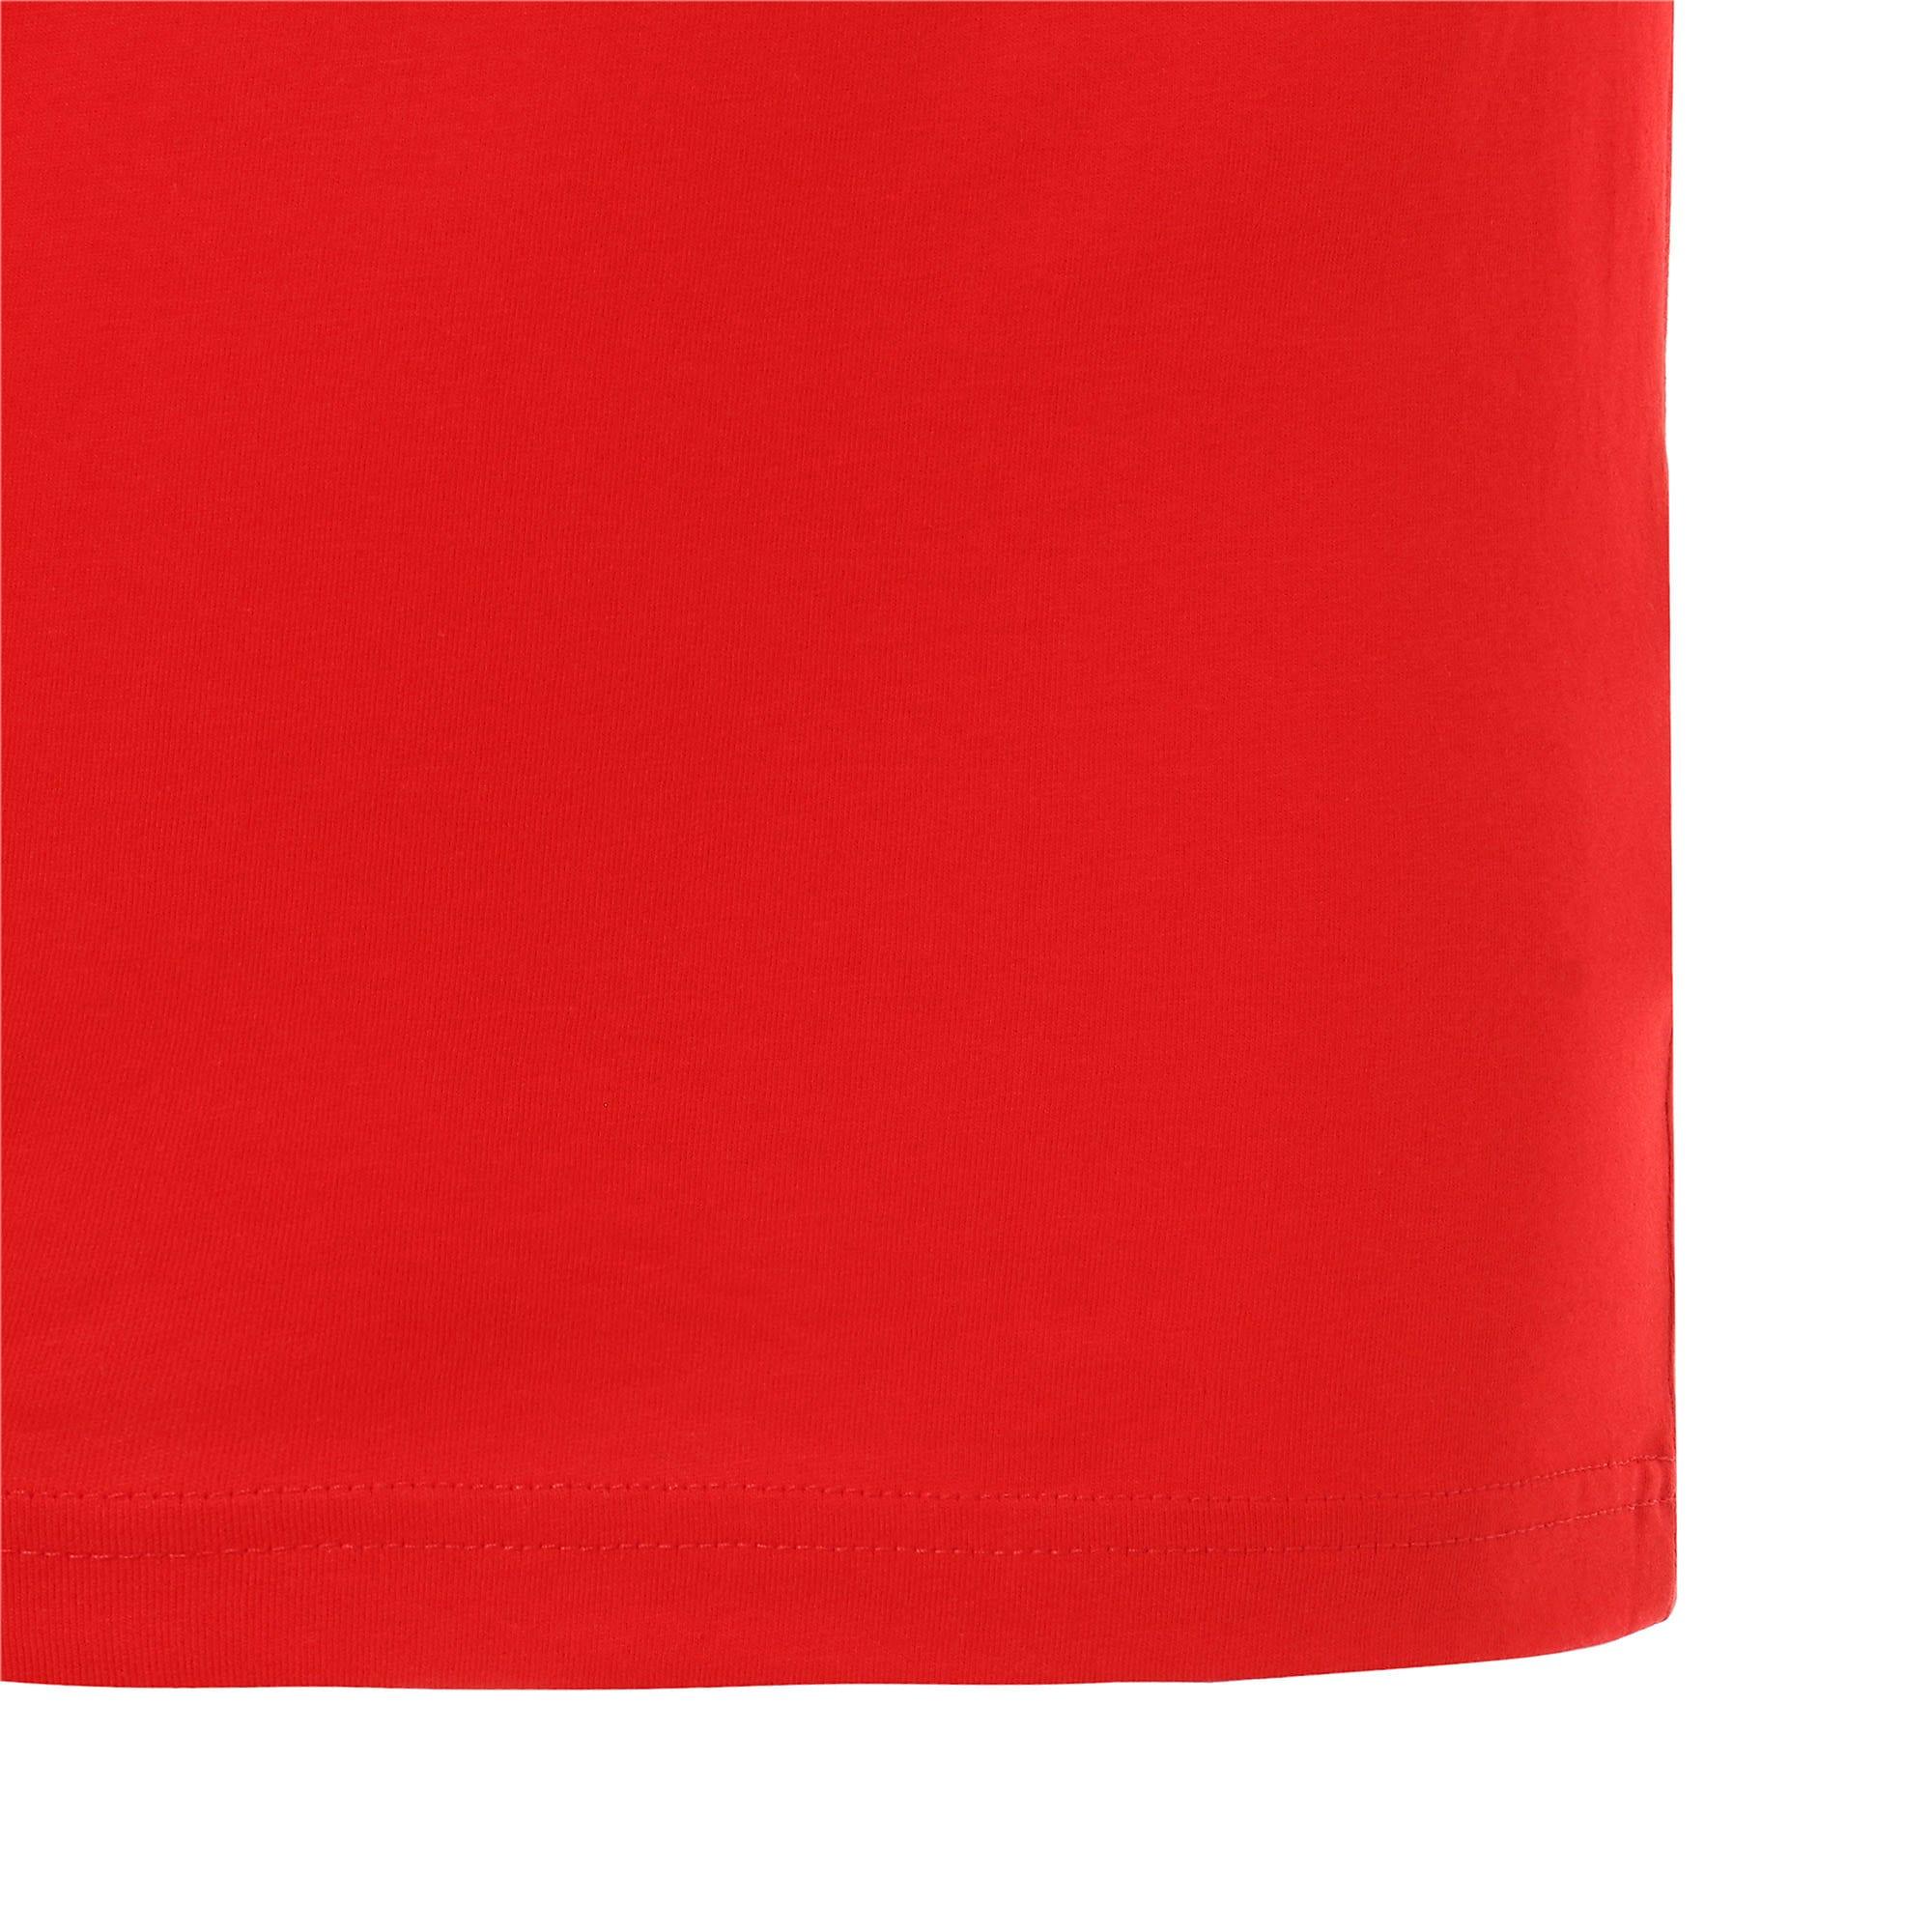 Thumbnail 9 of CLASSICS ロゴ SS Tシャツ 半袖, High Risk Red, medium-JPN